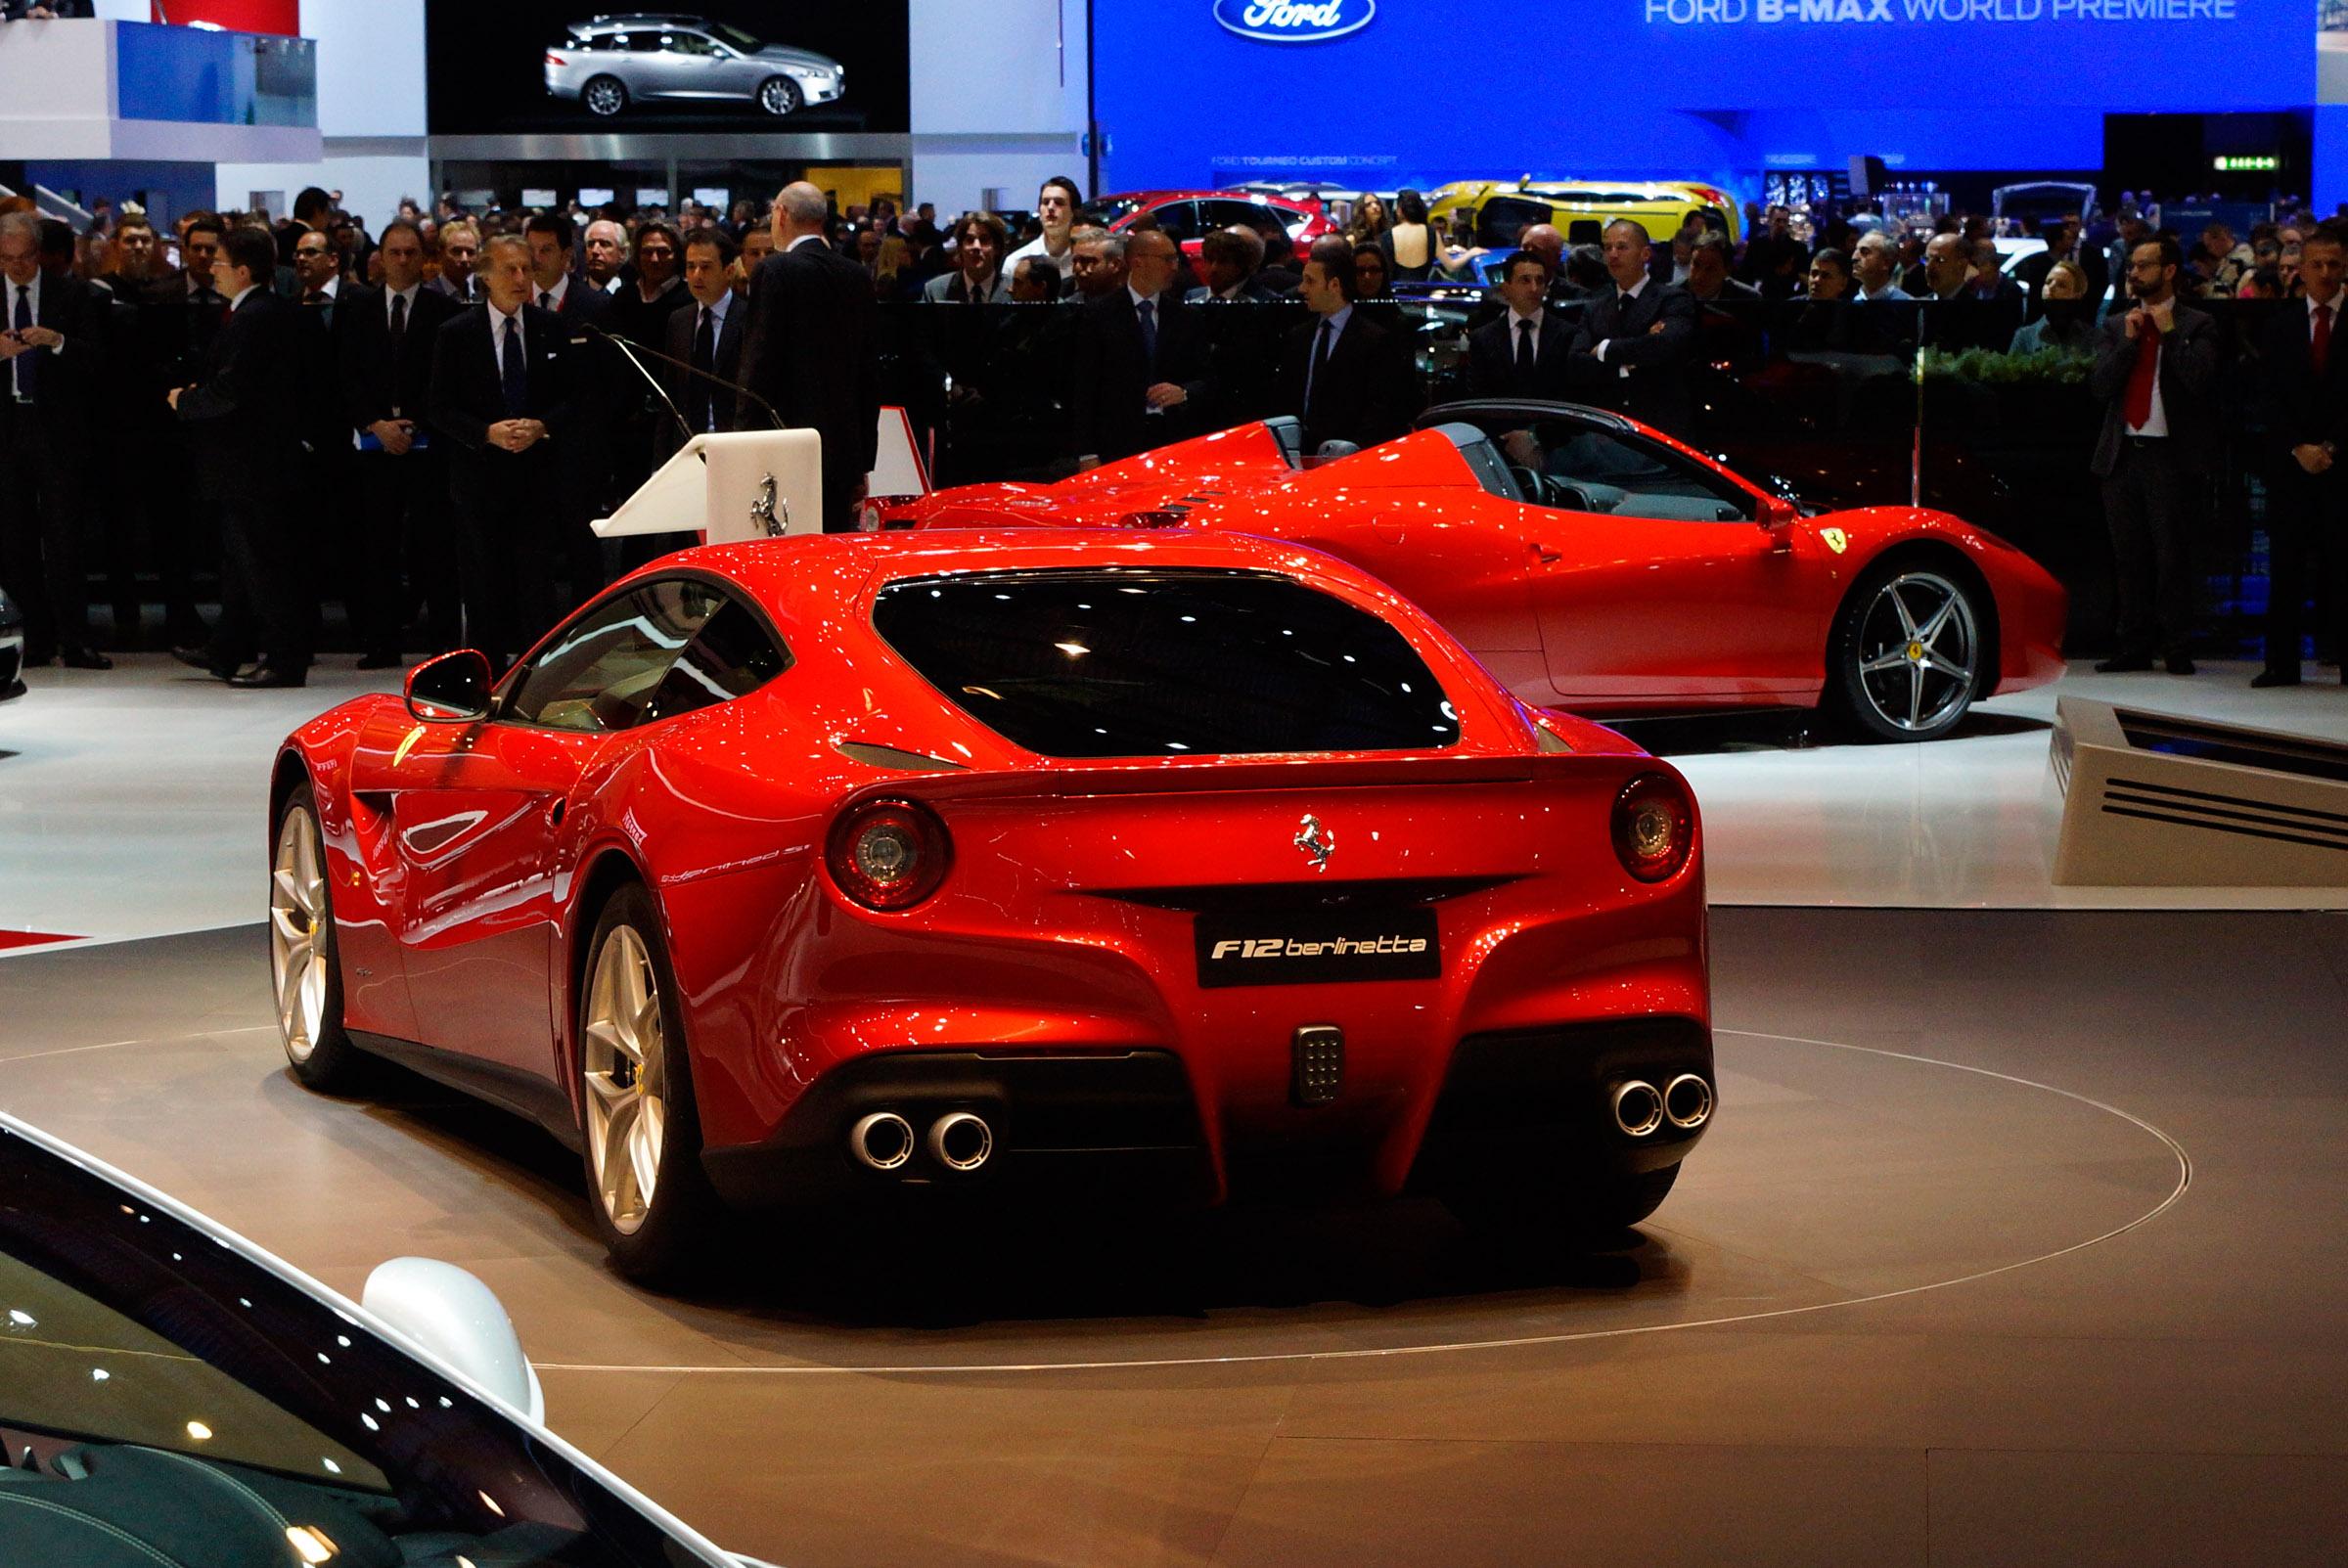 Ferrari F12berlinetta Official Hd Video